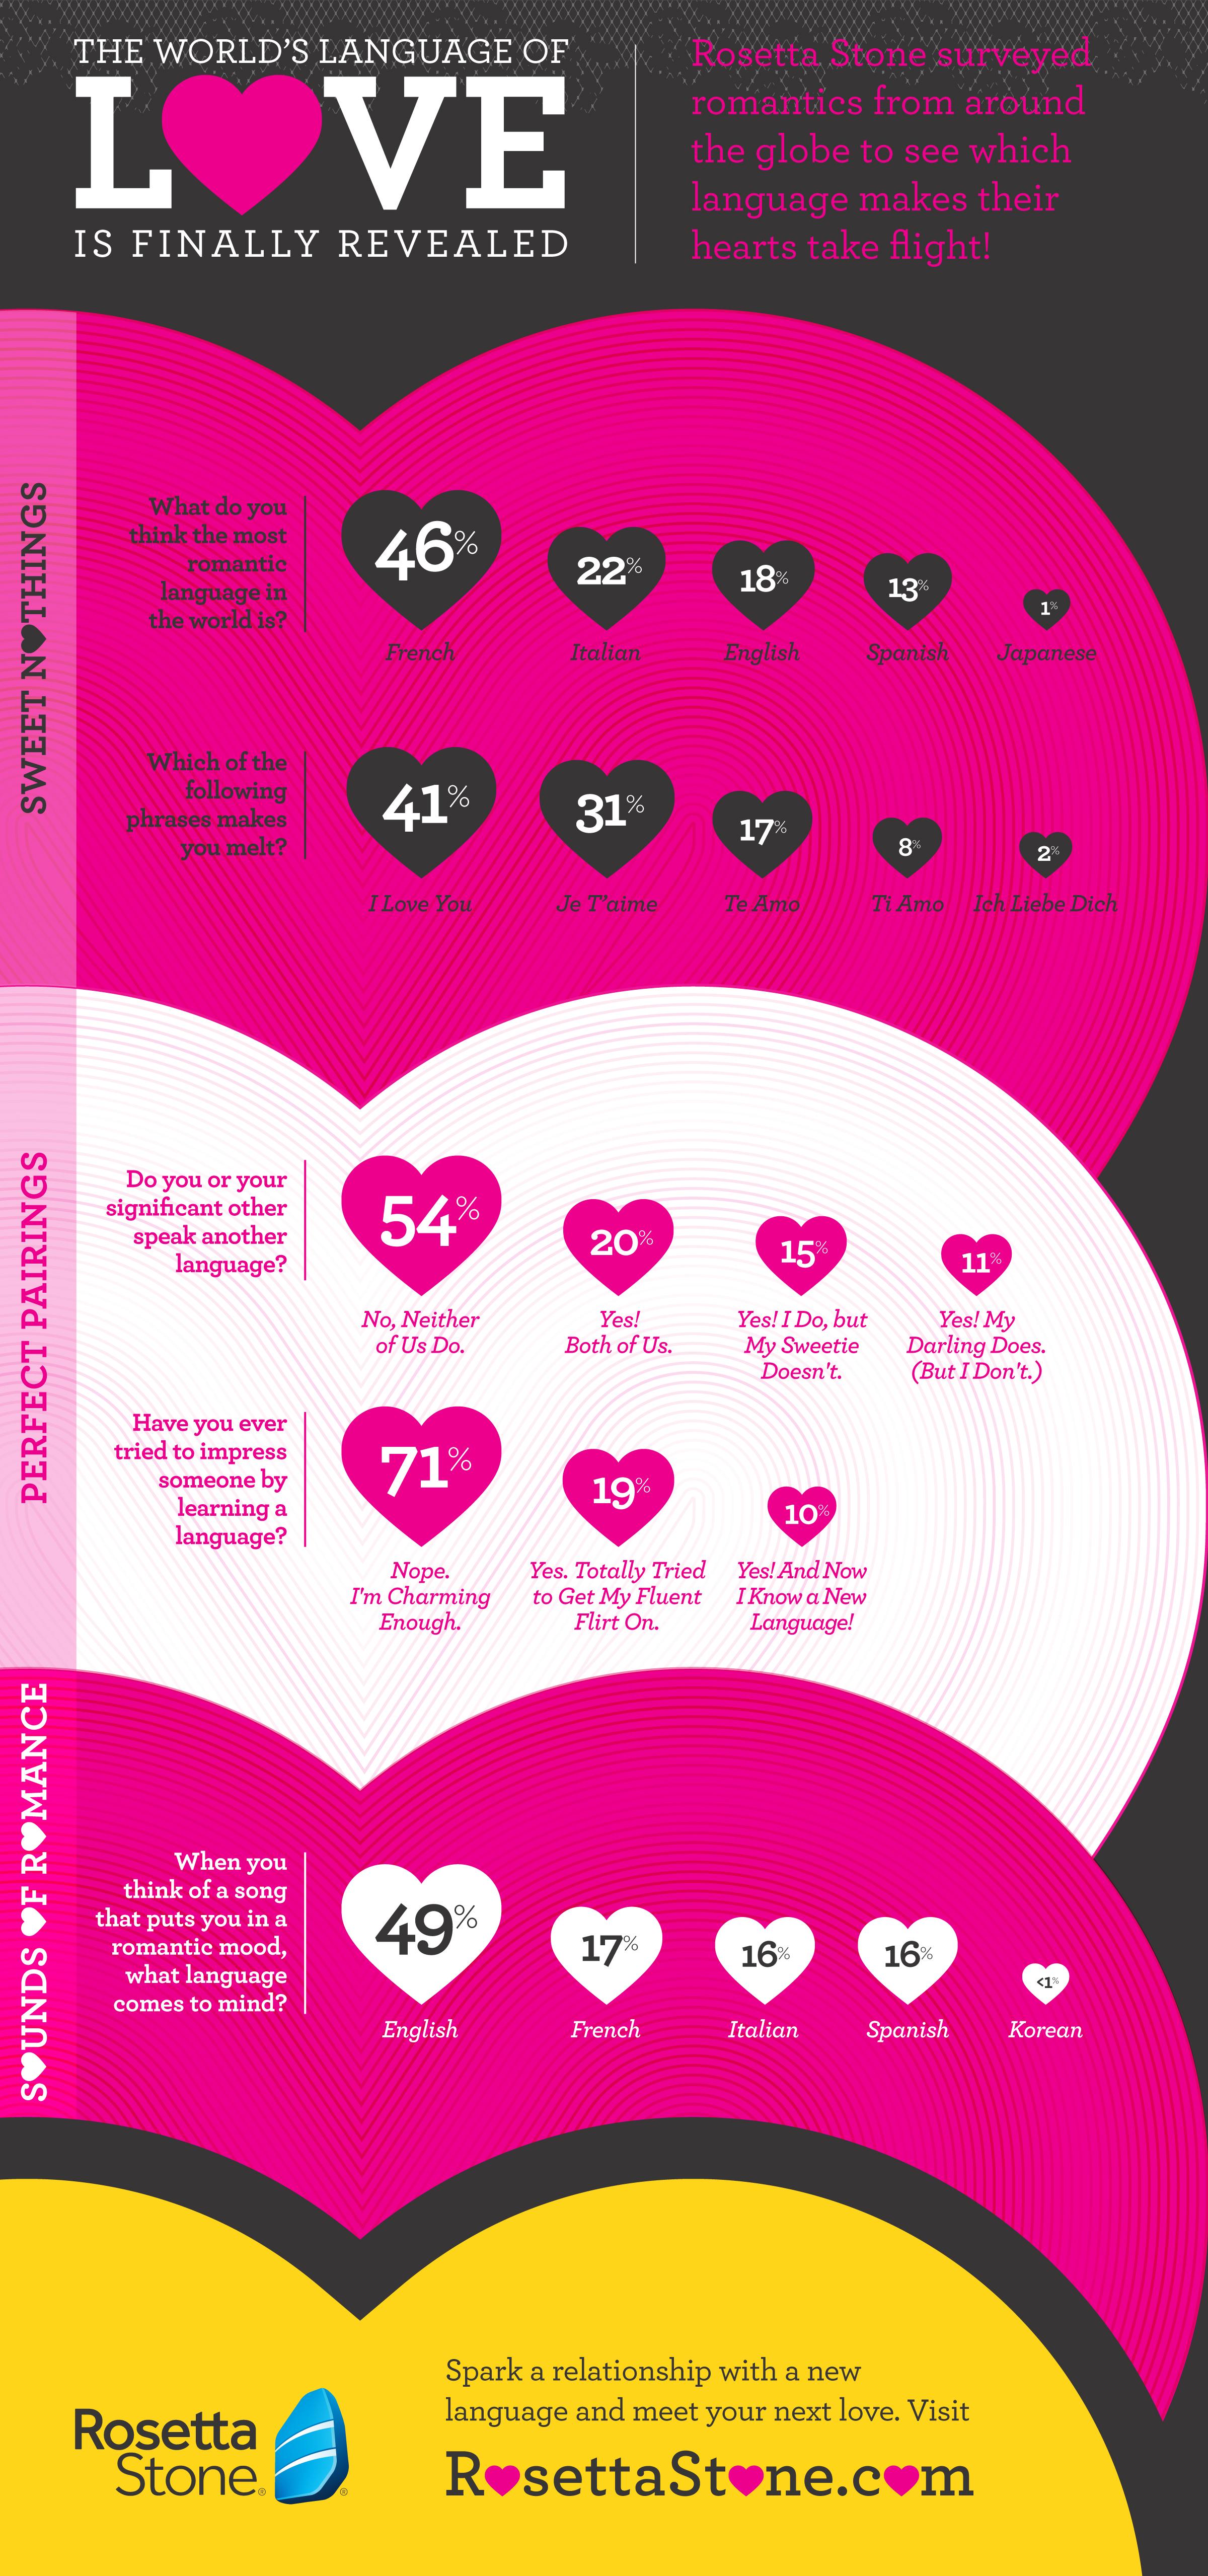 Rosetta Stone Valentine's Day Infographic